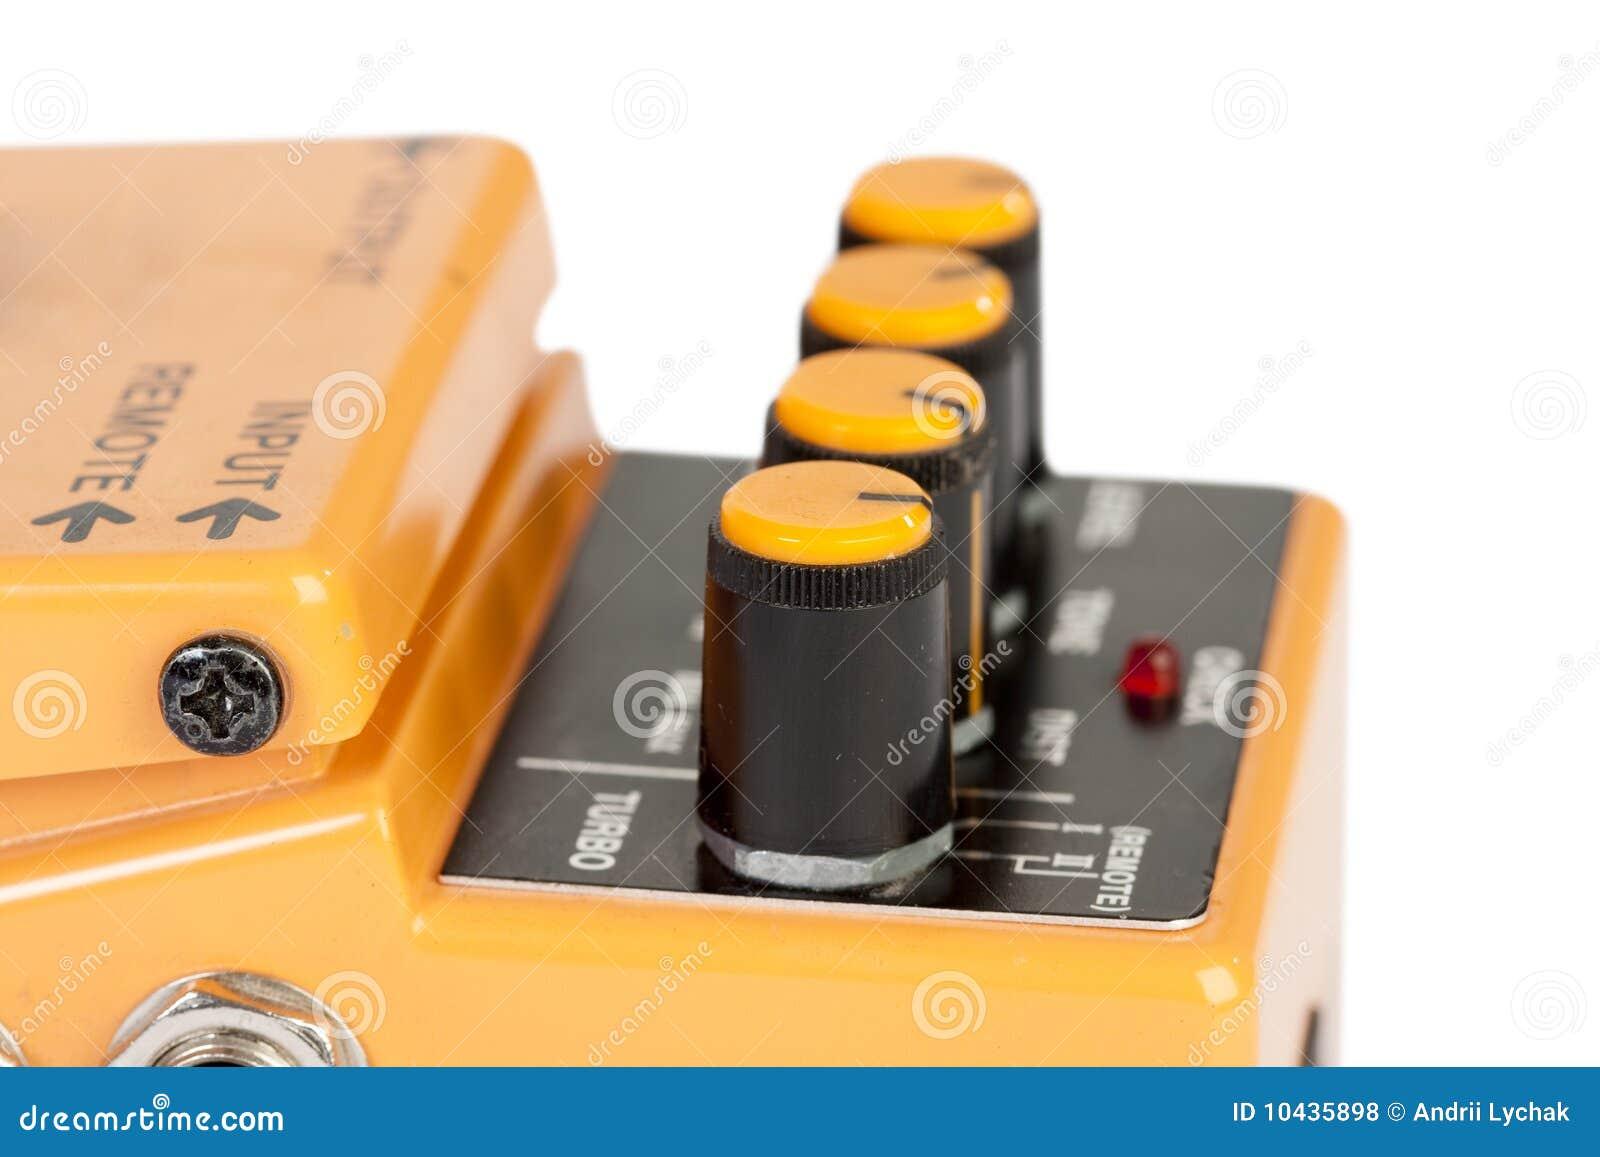 Audio Distortion Device Royalty Free Stock Photos - Image ...